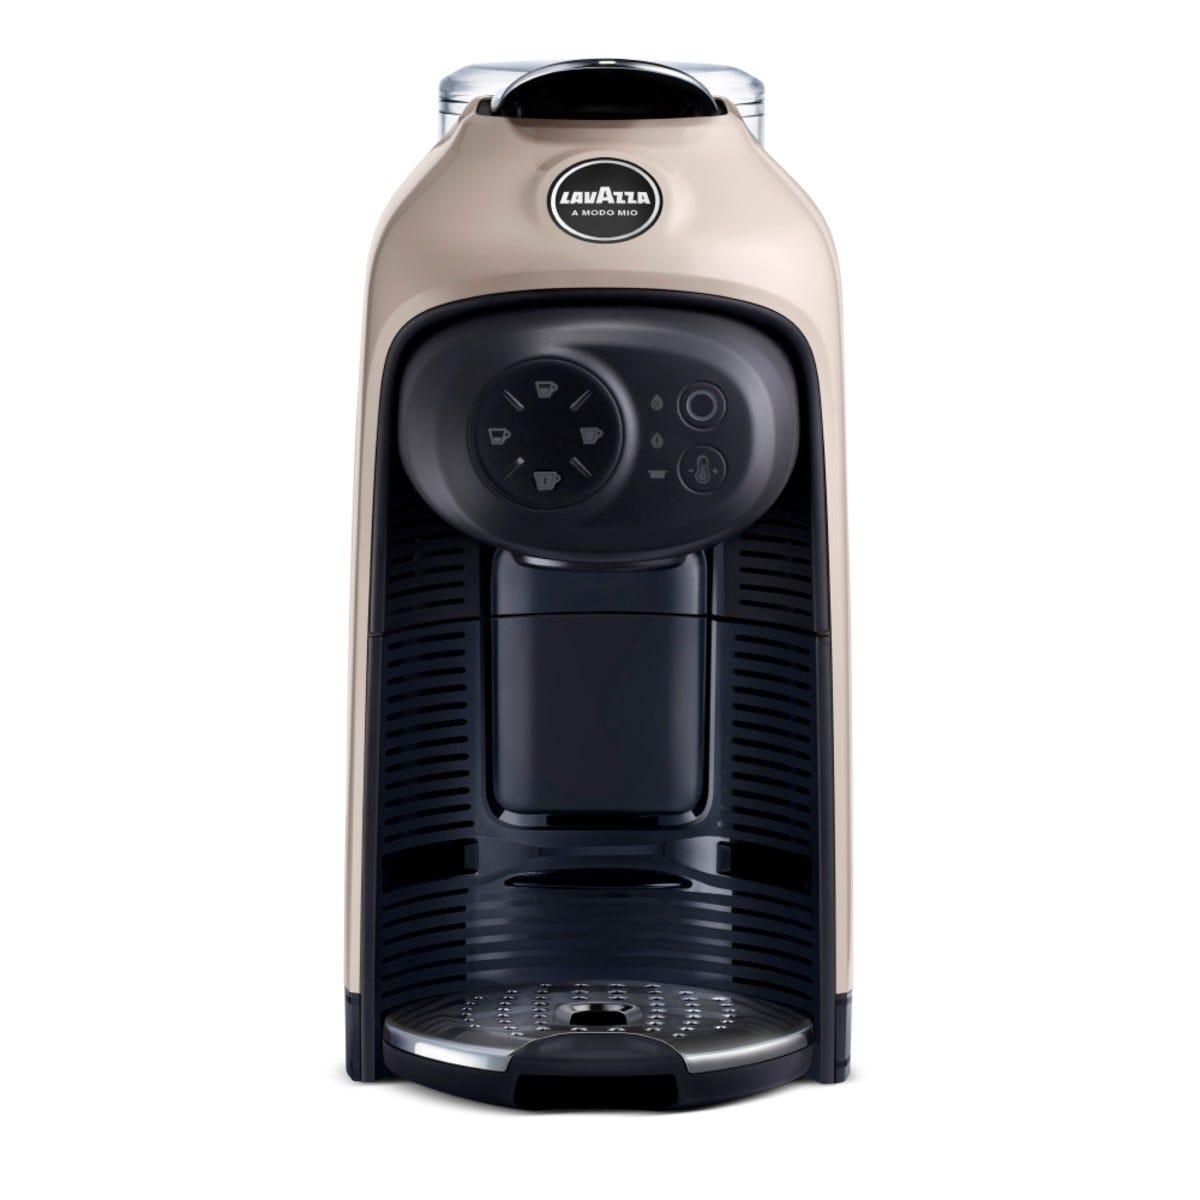 Lavazza 18000279 Idola Coffee Machine - Cream